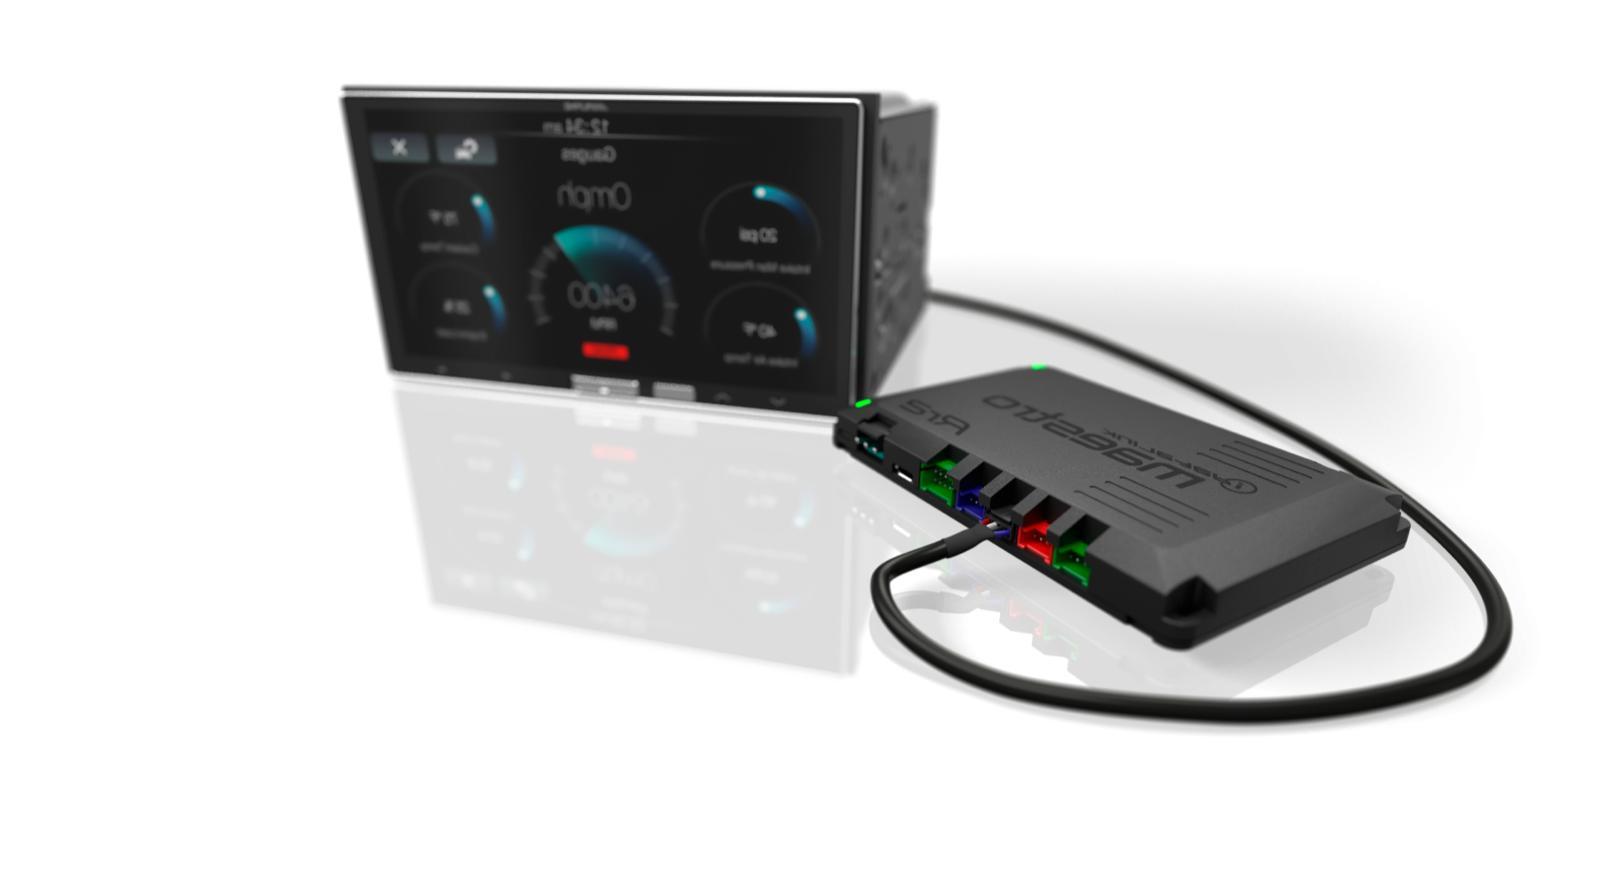 iDatalink MRR2 Advanced Replacement Interface